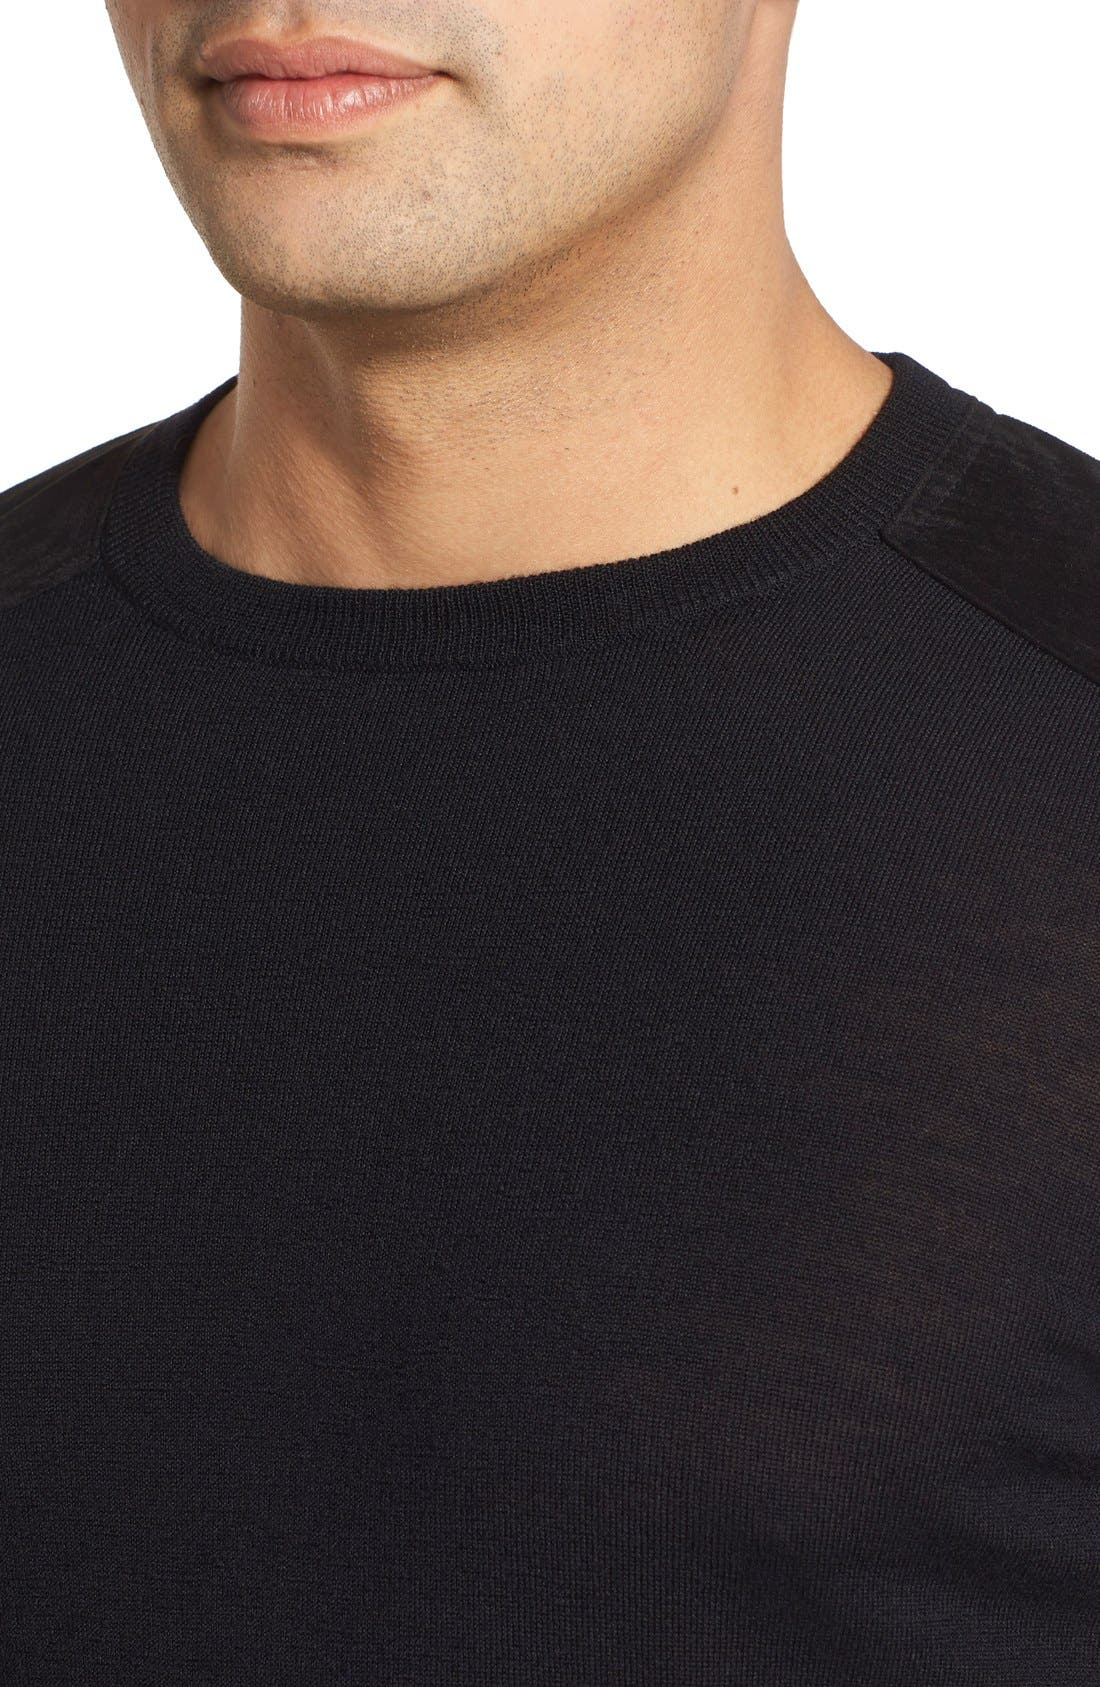 Regular Fit Crewneck Sweater,                             Alternate thumbnail 2, color,                             001